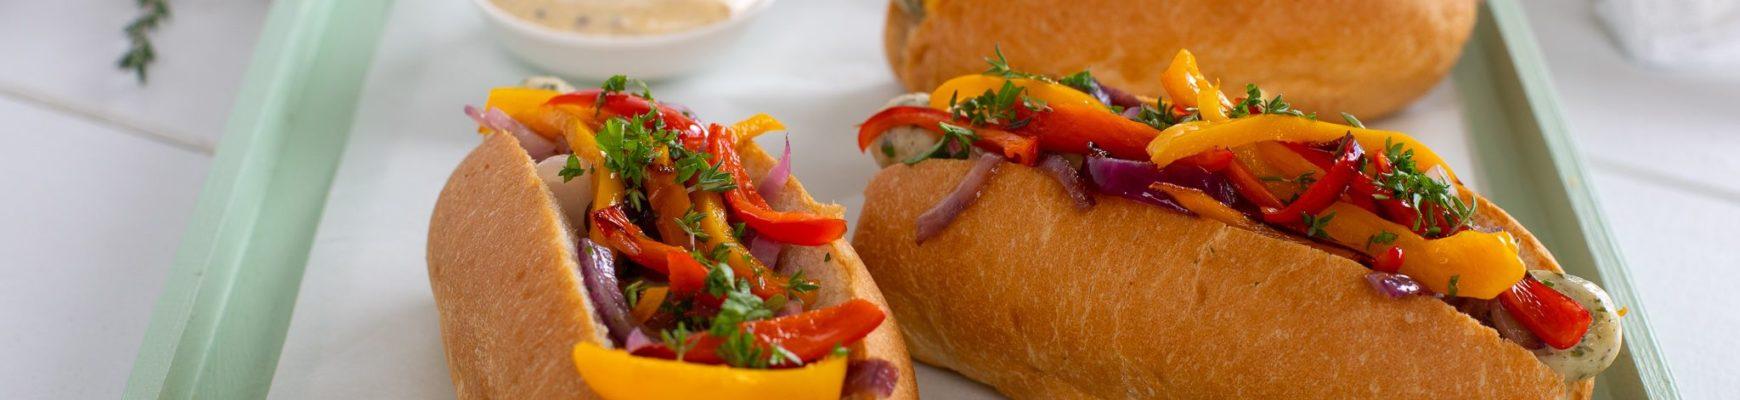 chicken hotdog